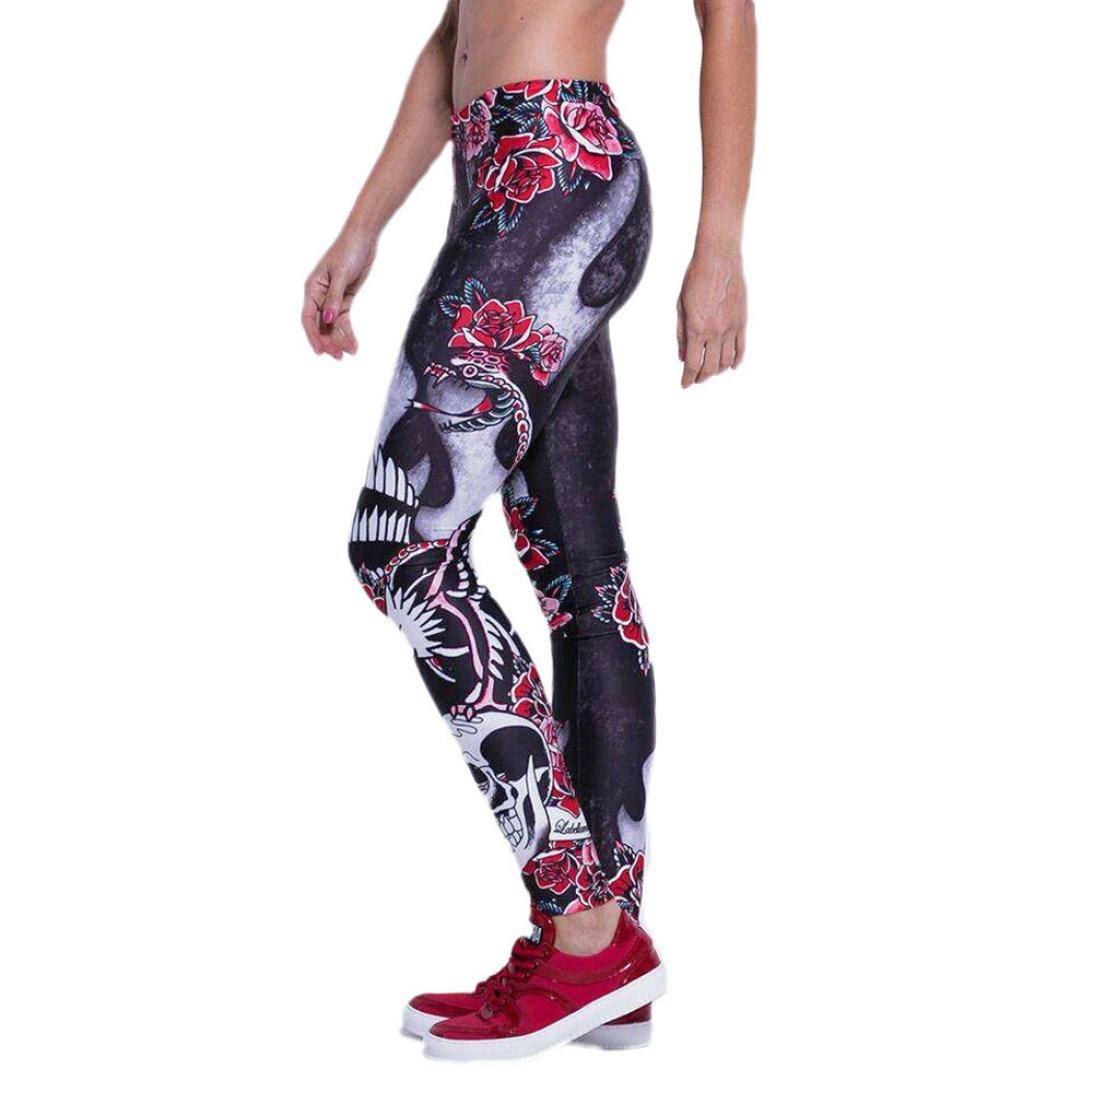 Homebaby Cranio Sport Leggings Sportivi Donna Pantaloni Tagliati – Eleganti  Leggings Yoga Opaco Fitness Spandex Palestra Pantaloni Leggins Push Up- ... fbddc7961ad